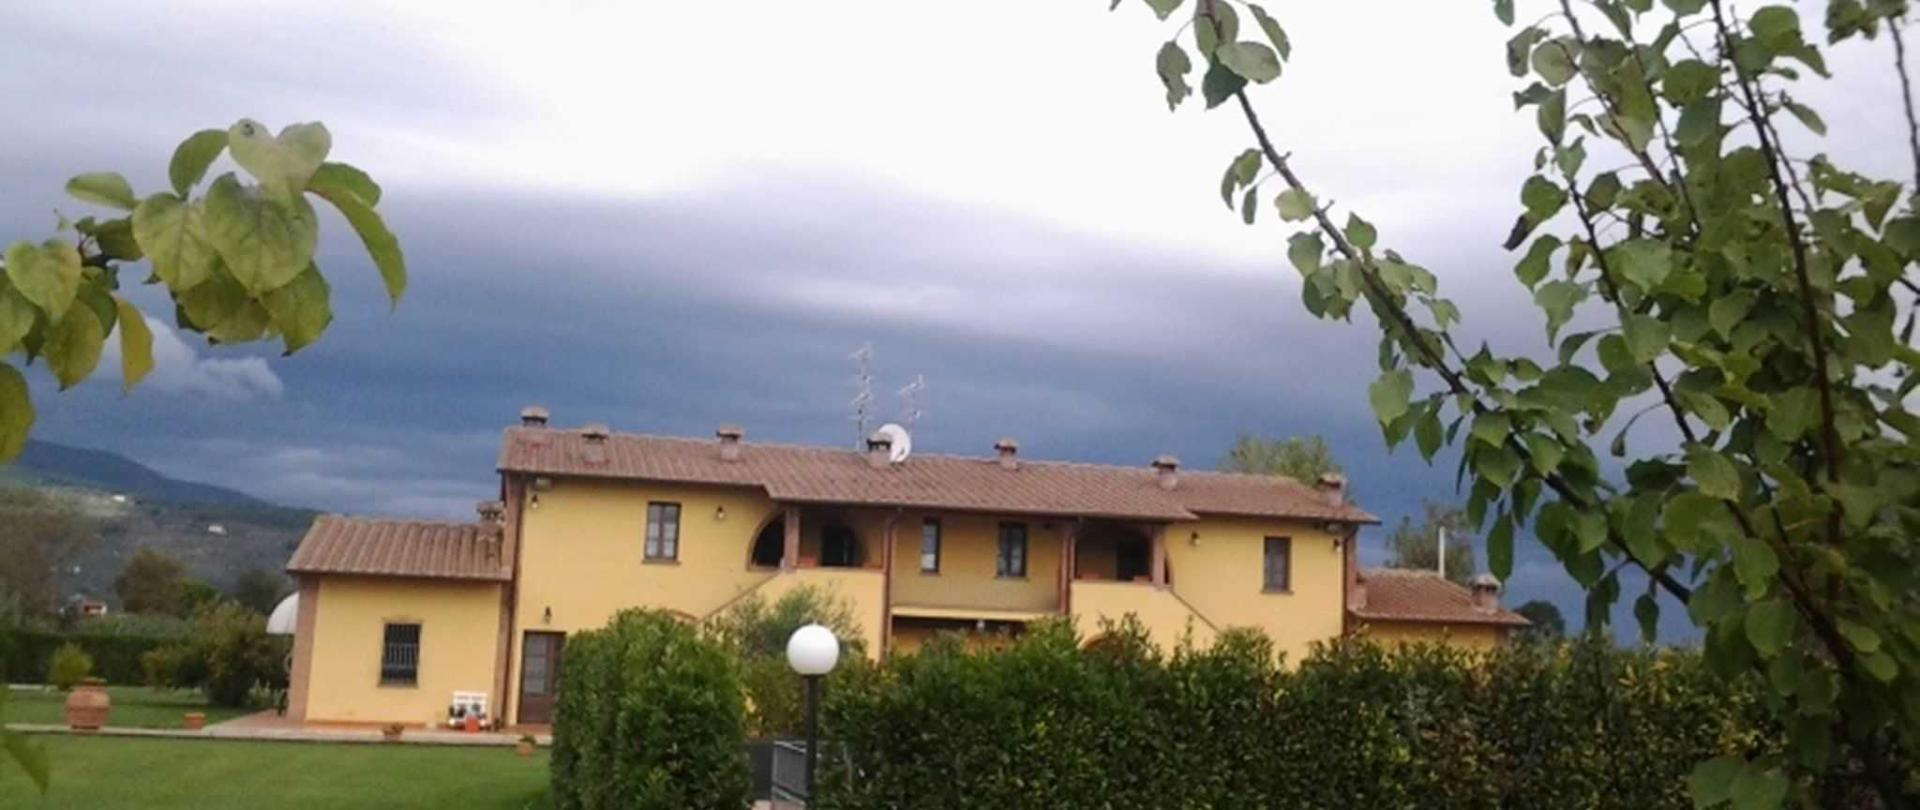 esterno-nuvole-pozzo-1.jpg